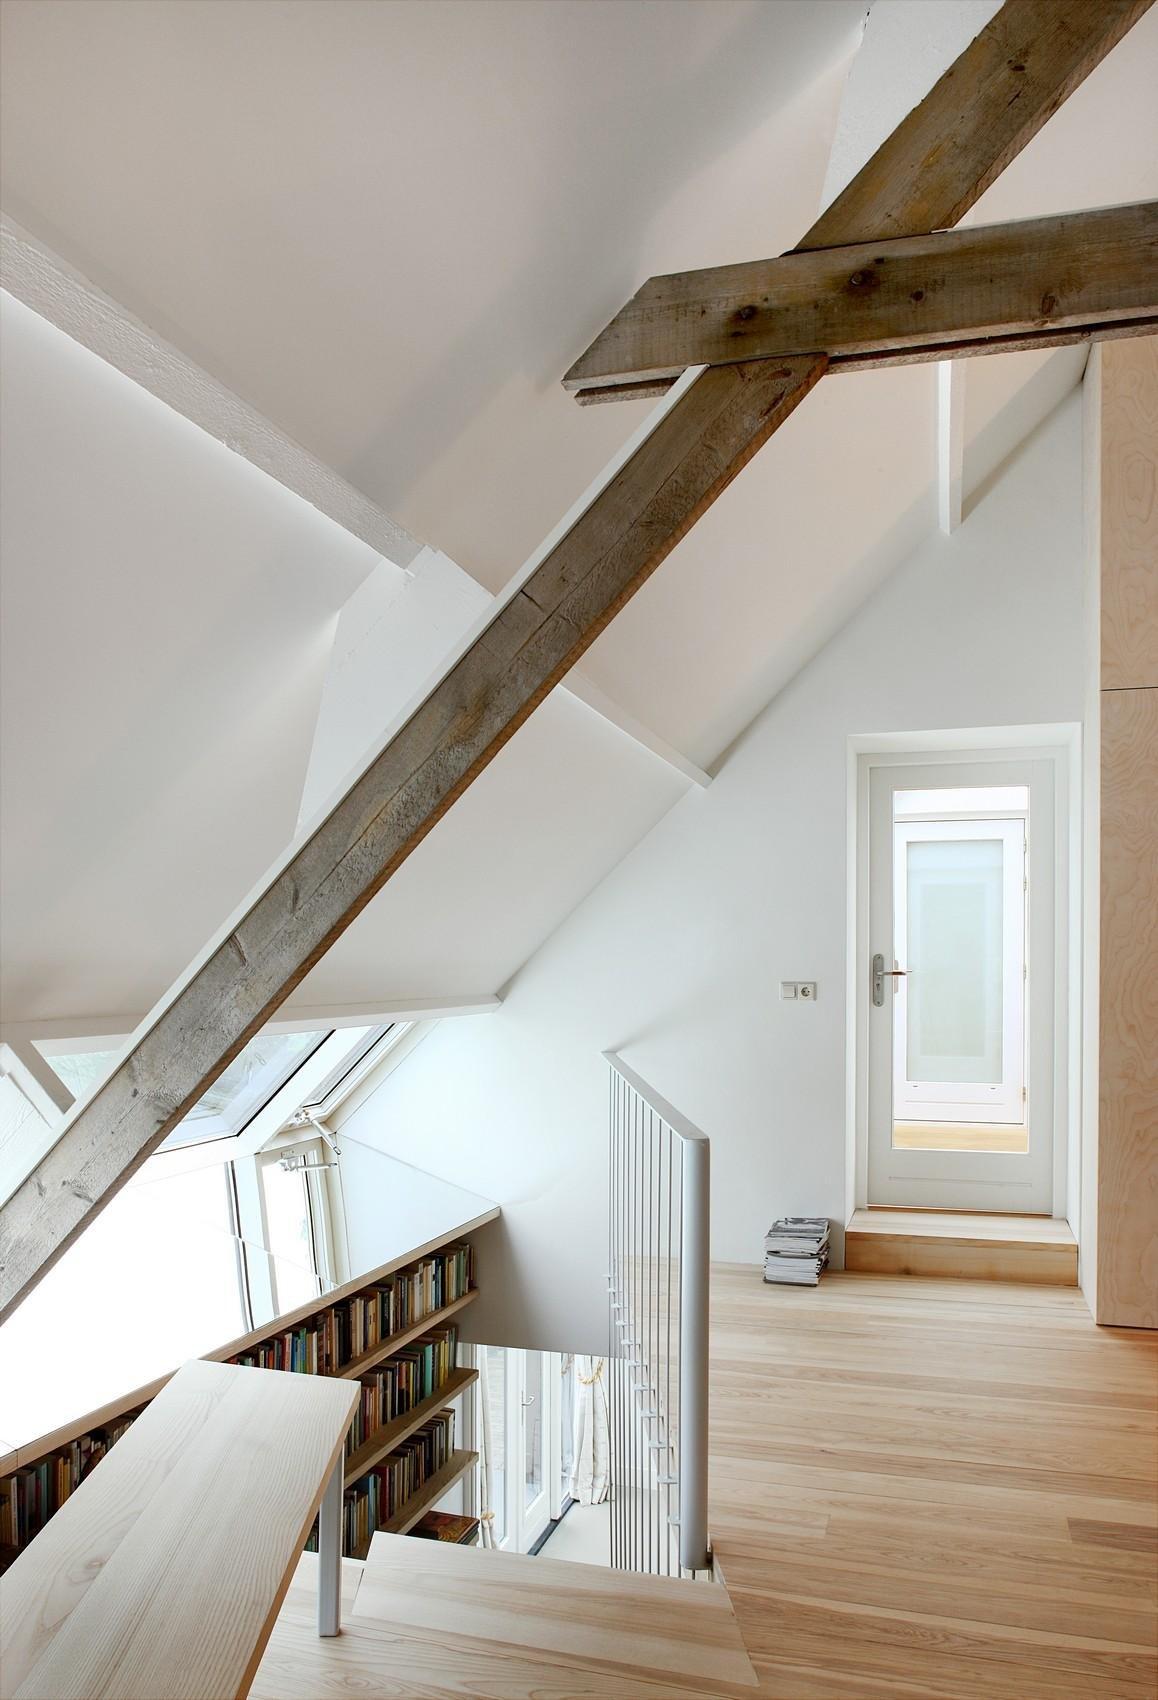 Bookshelf, Barn Conversion in Geldermalsen, The Netherlands